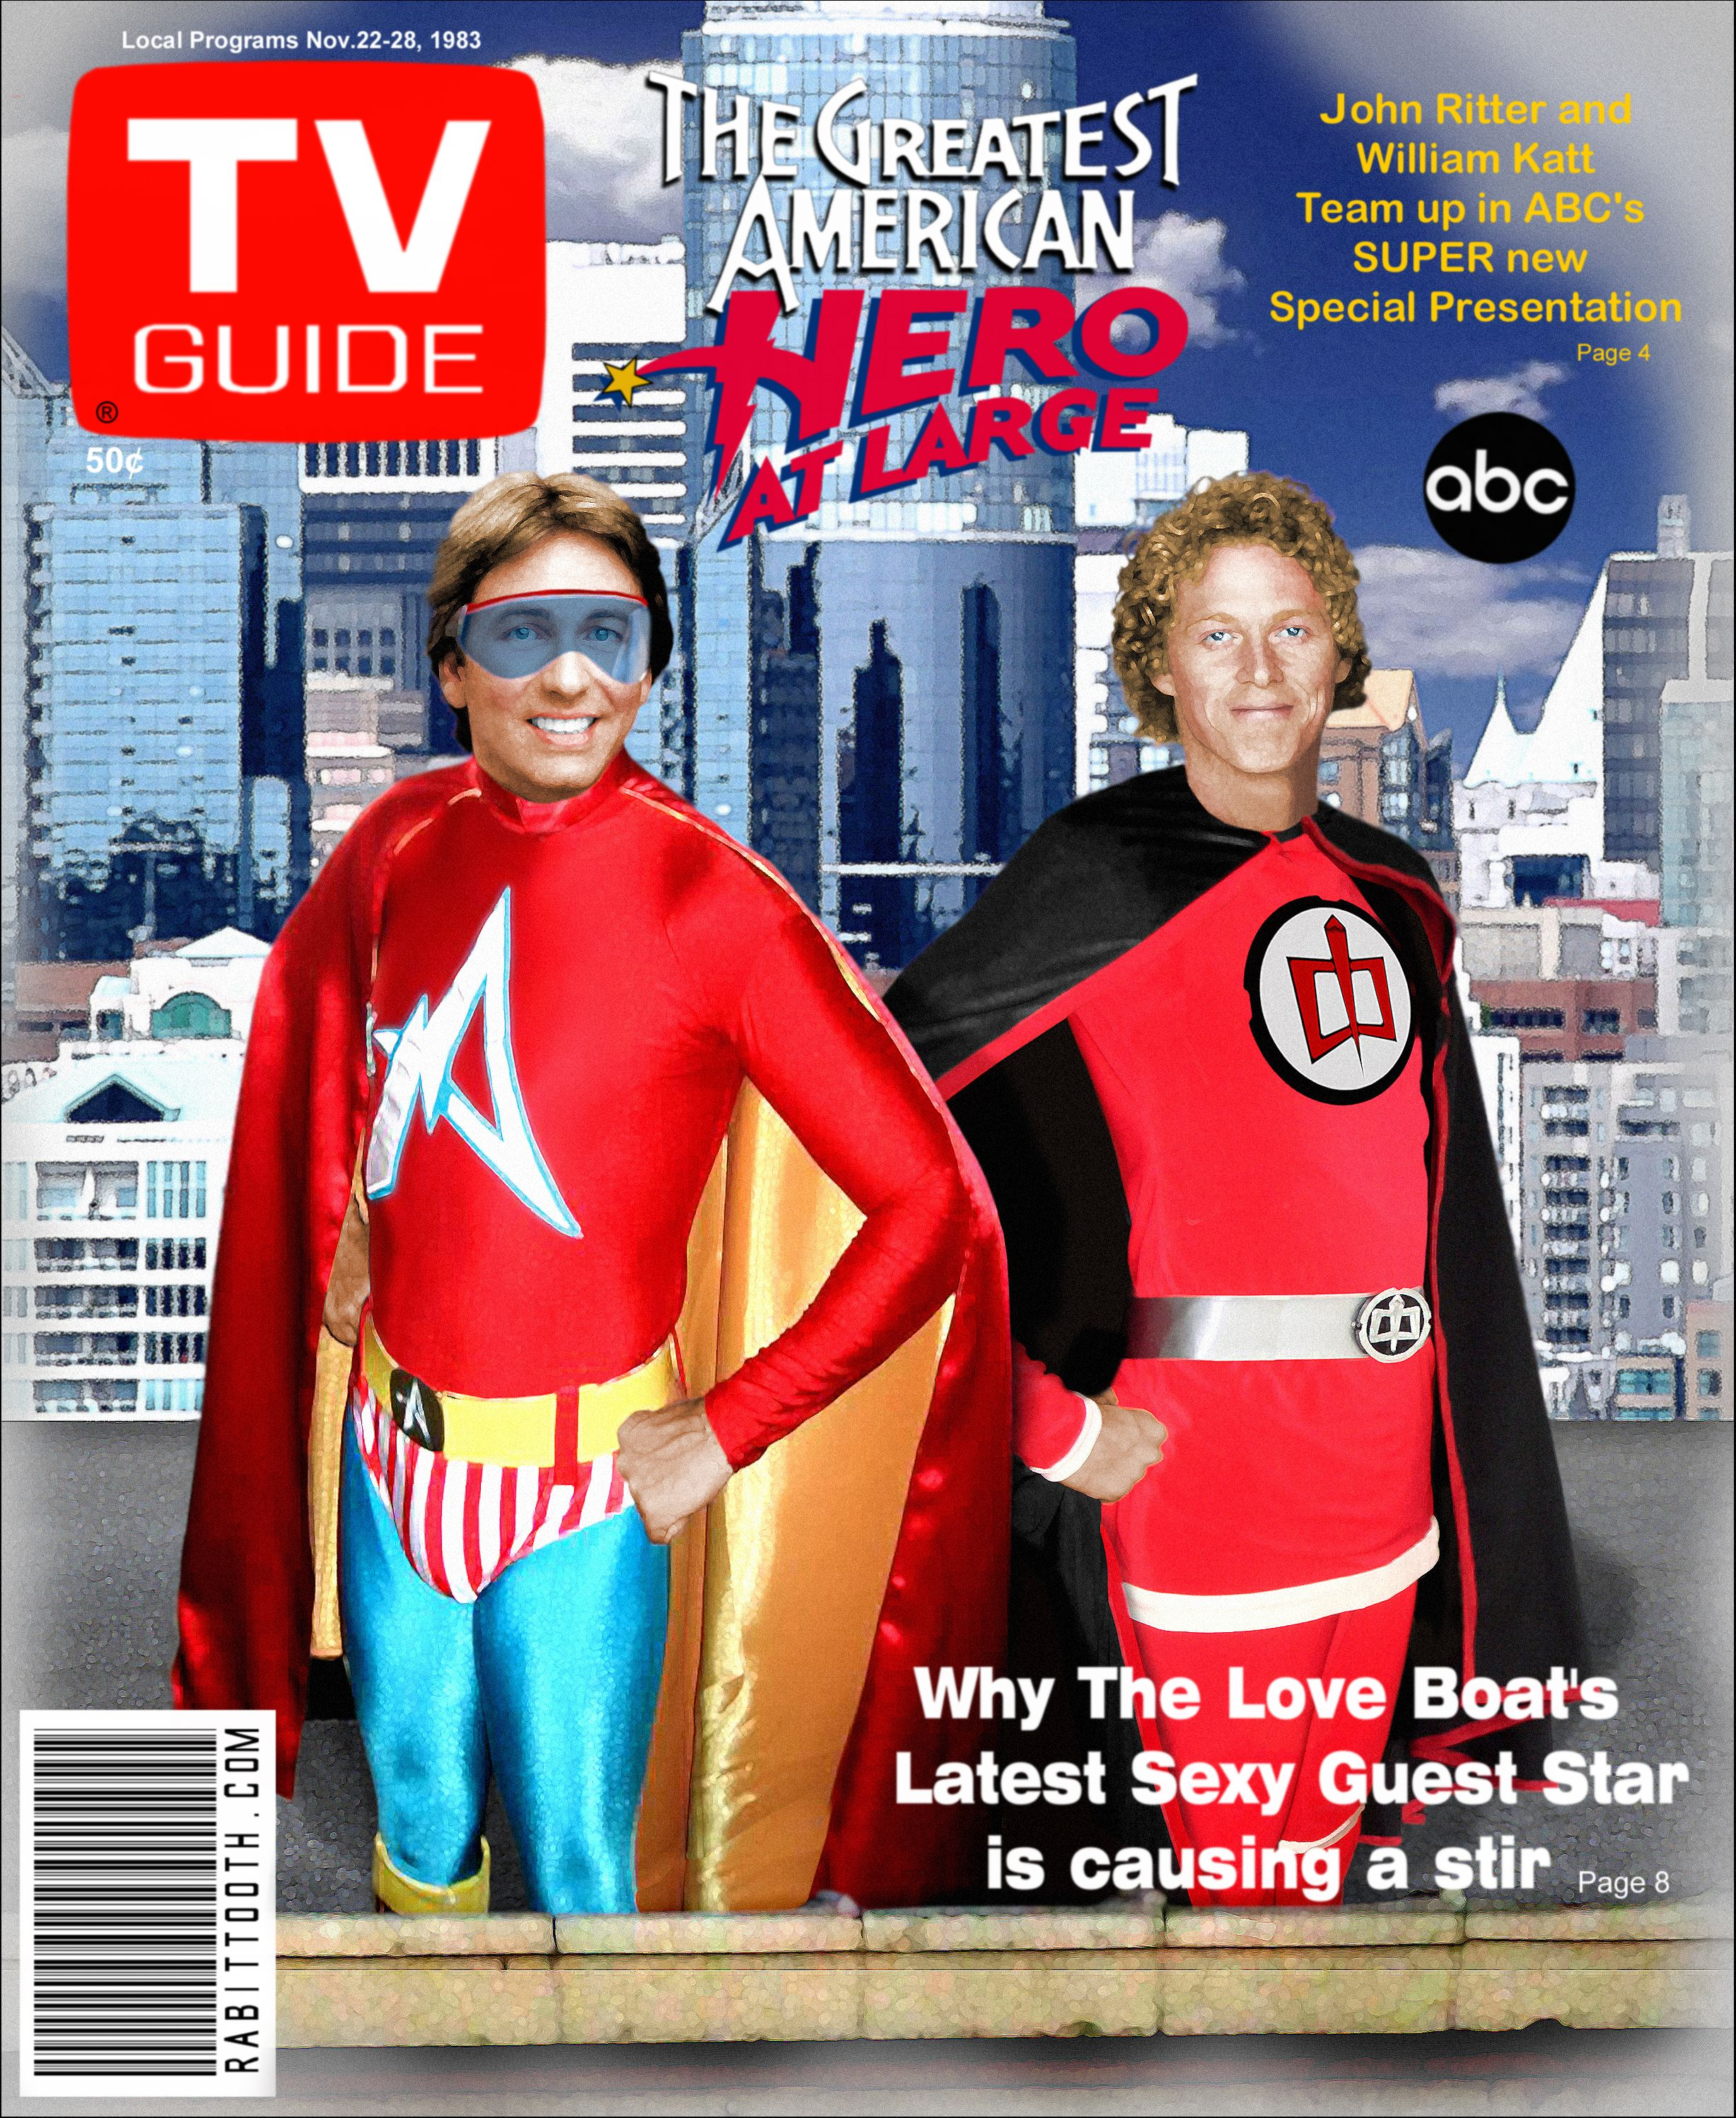 THE GREATEST AMERICAN HERO WILLIAM KATT IN SUPERHERO ... |The Greatest American Hero Poster